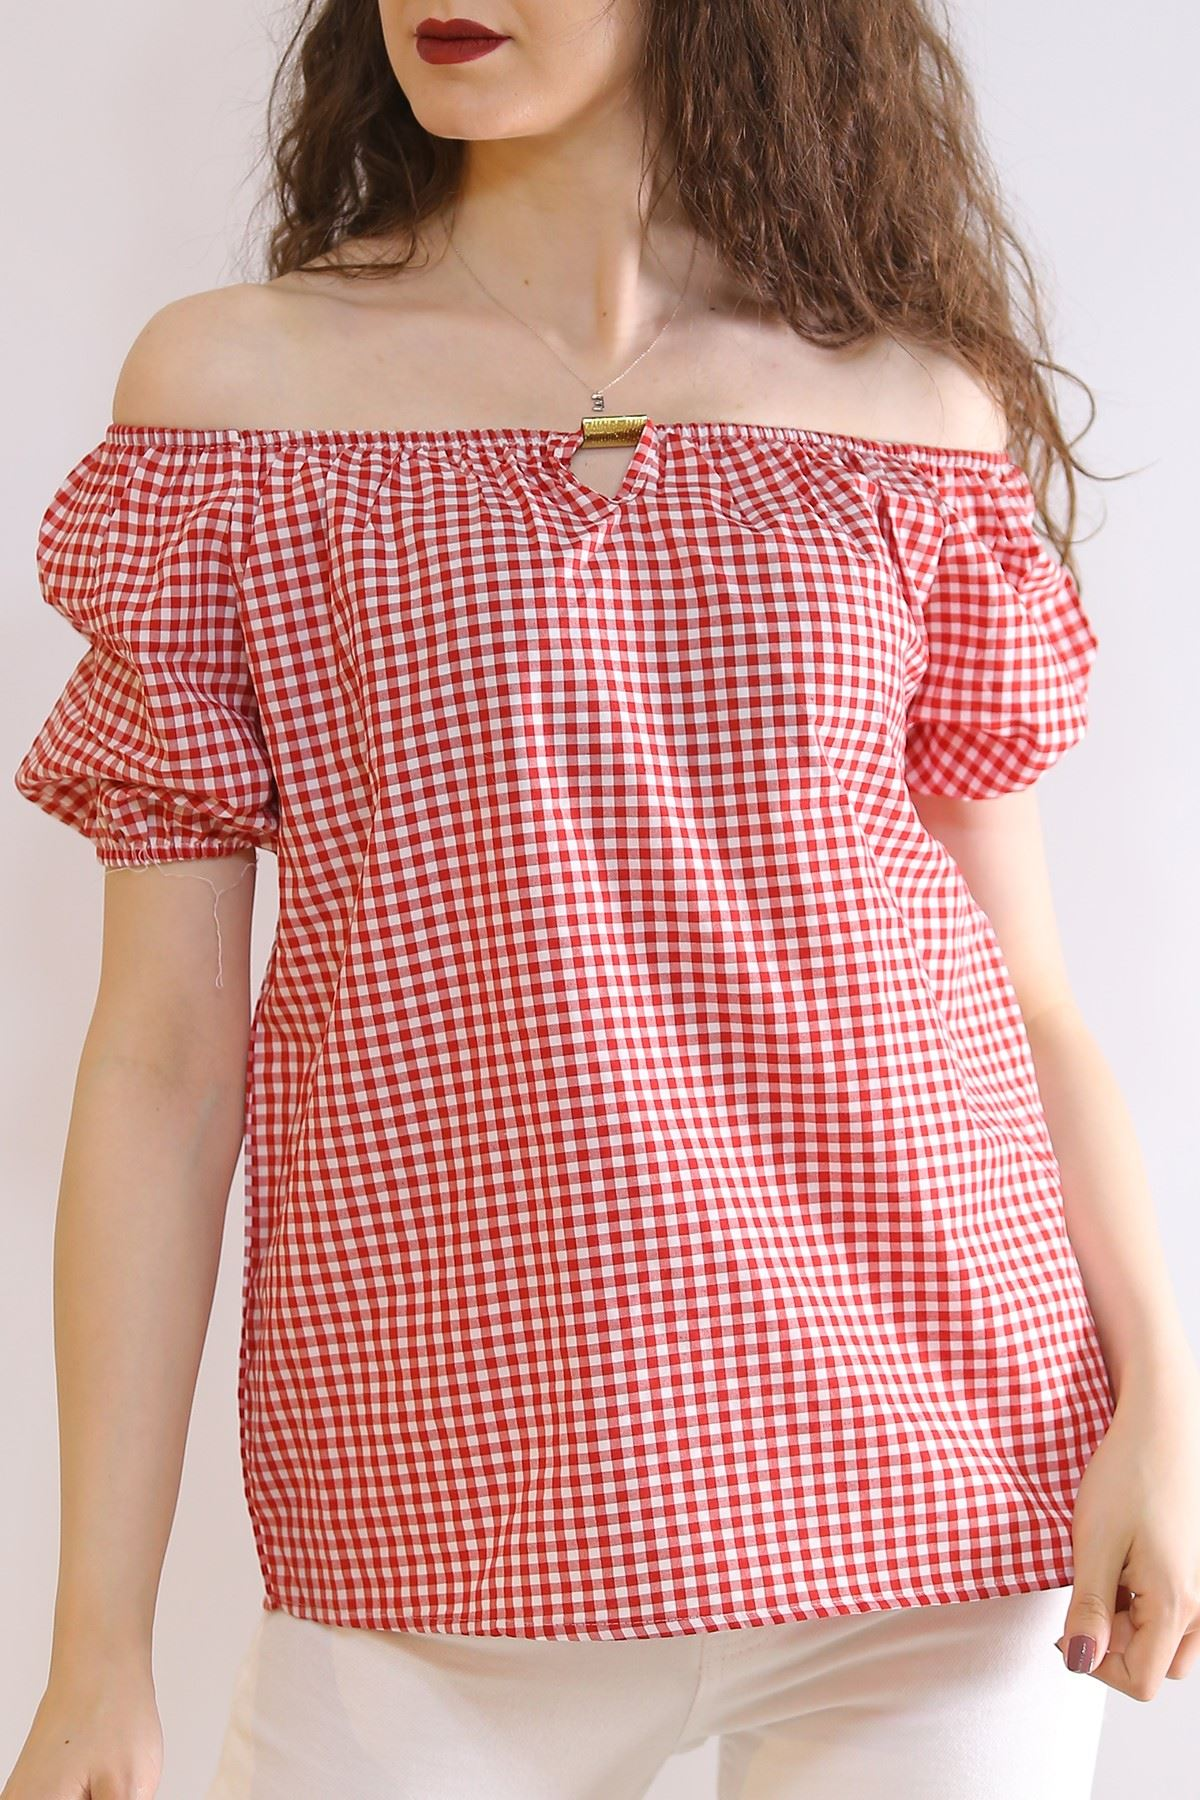 Kayık Yaka Bluz Kırmızı - 5980.107.